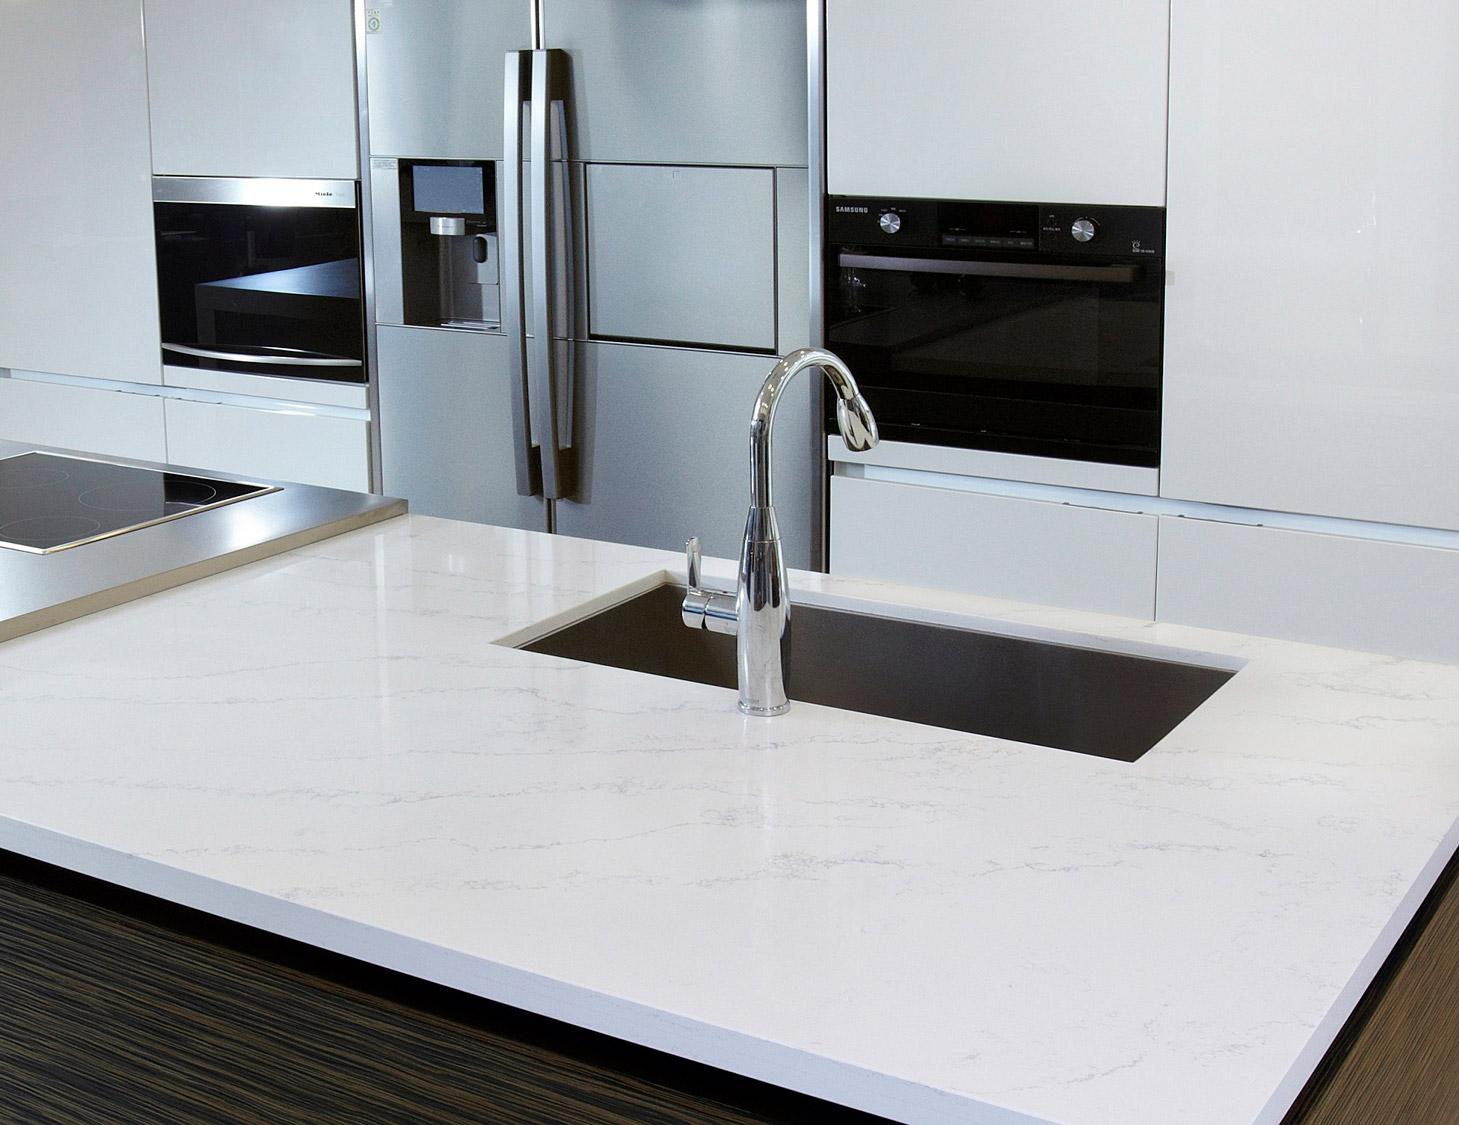 HanStone Quartz Countertops - GLACIER COLLECTION - Tranquility